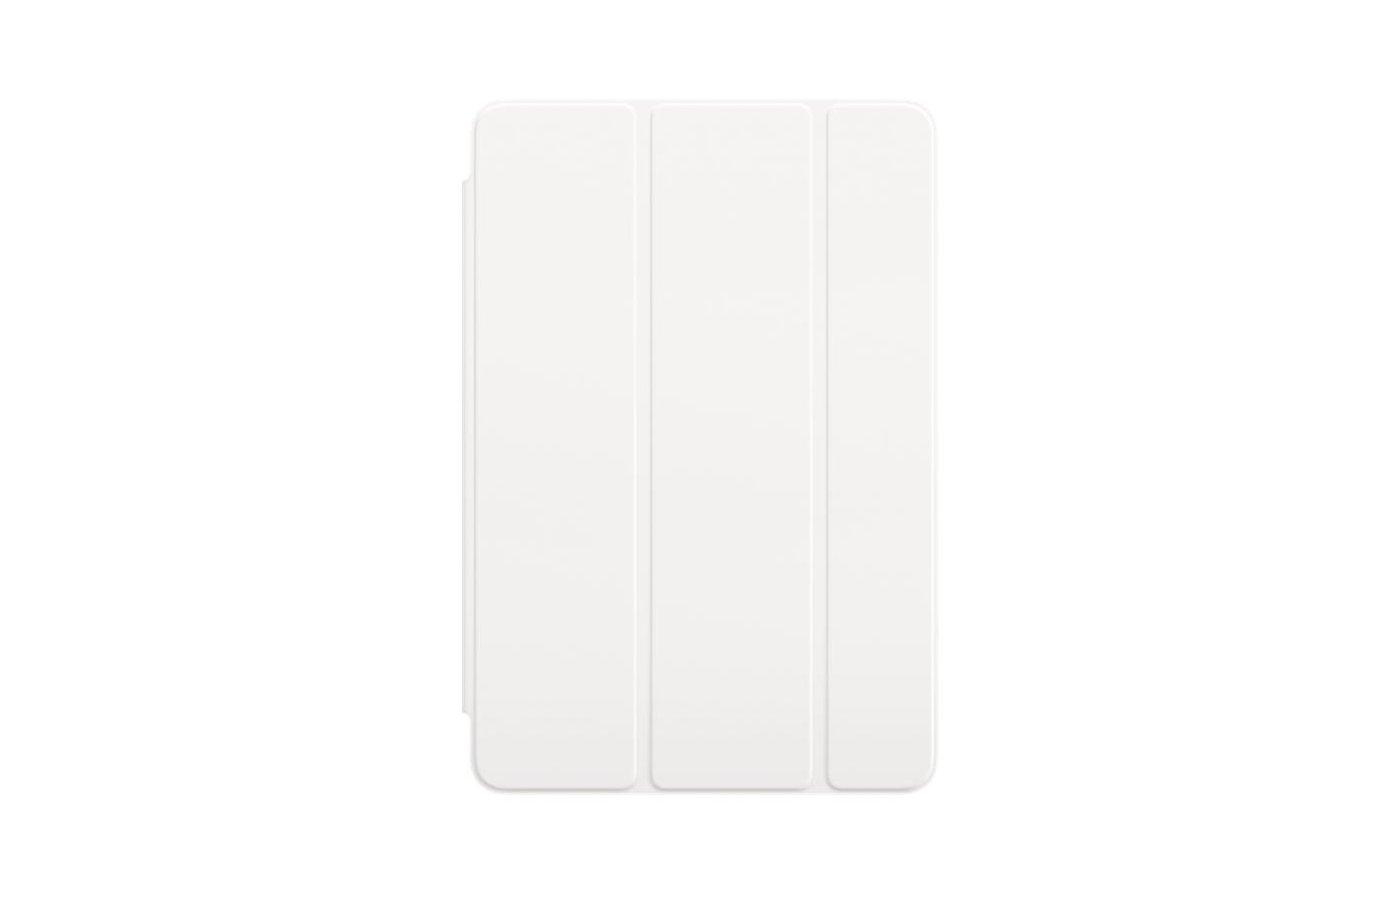 Чехол для планшетного ПК Apple iPad mini 4 Smart Cover - White (MKLW2ZM/A)